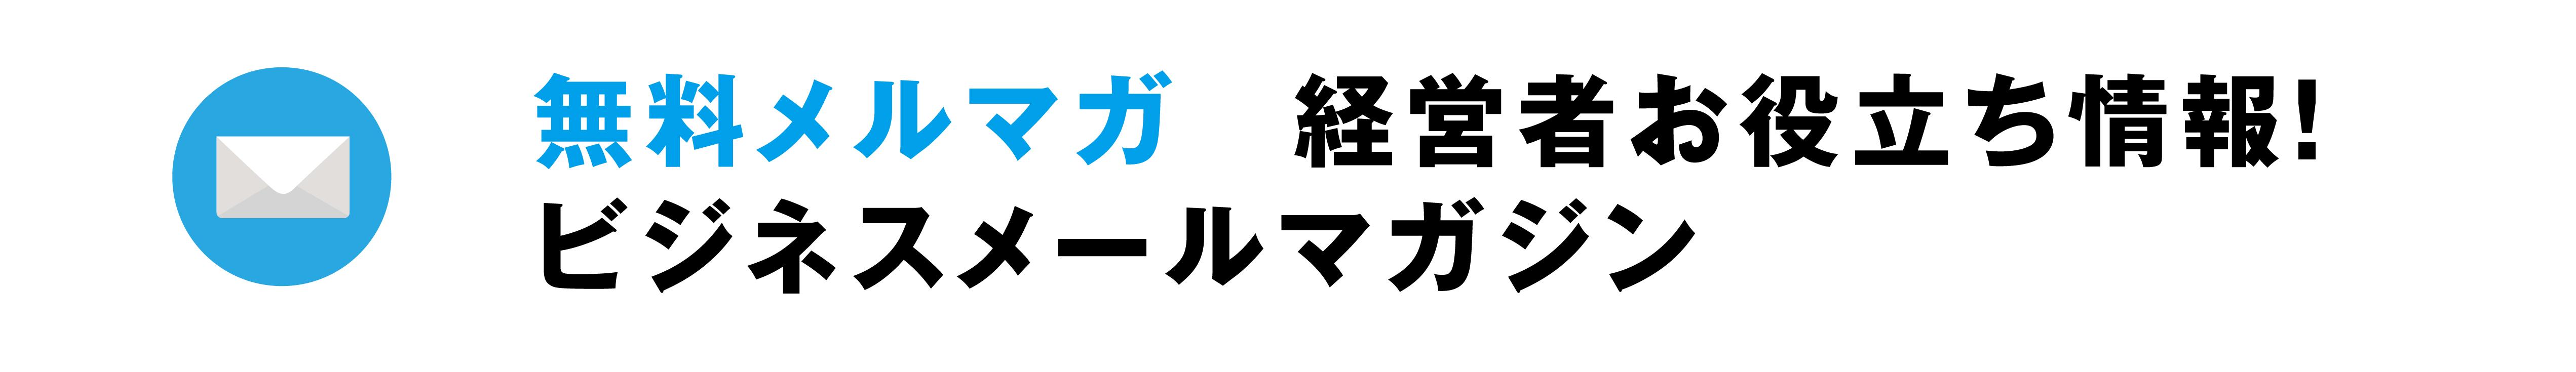 _blog_ハ?ナー 2-03.jpg